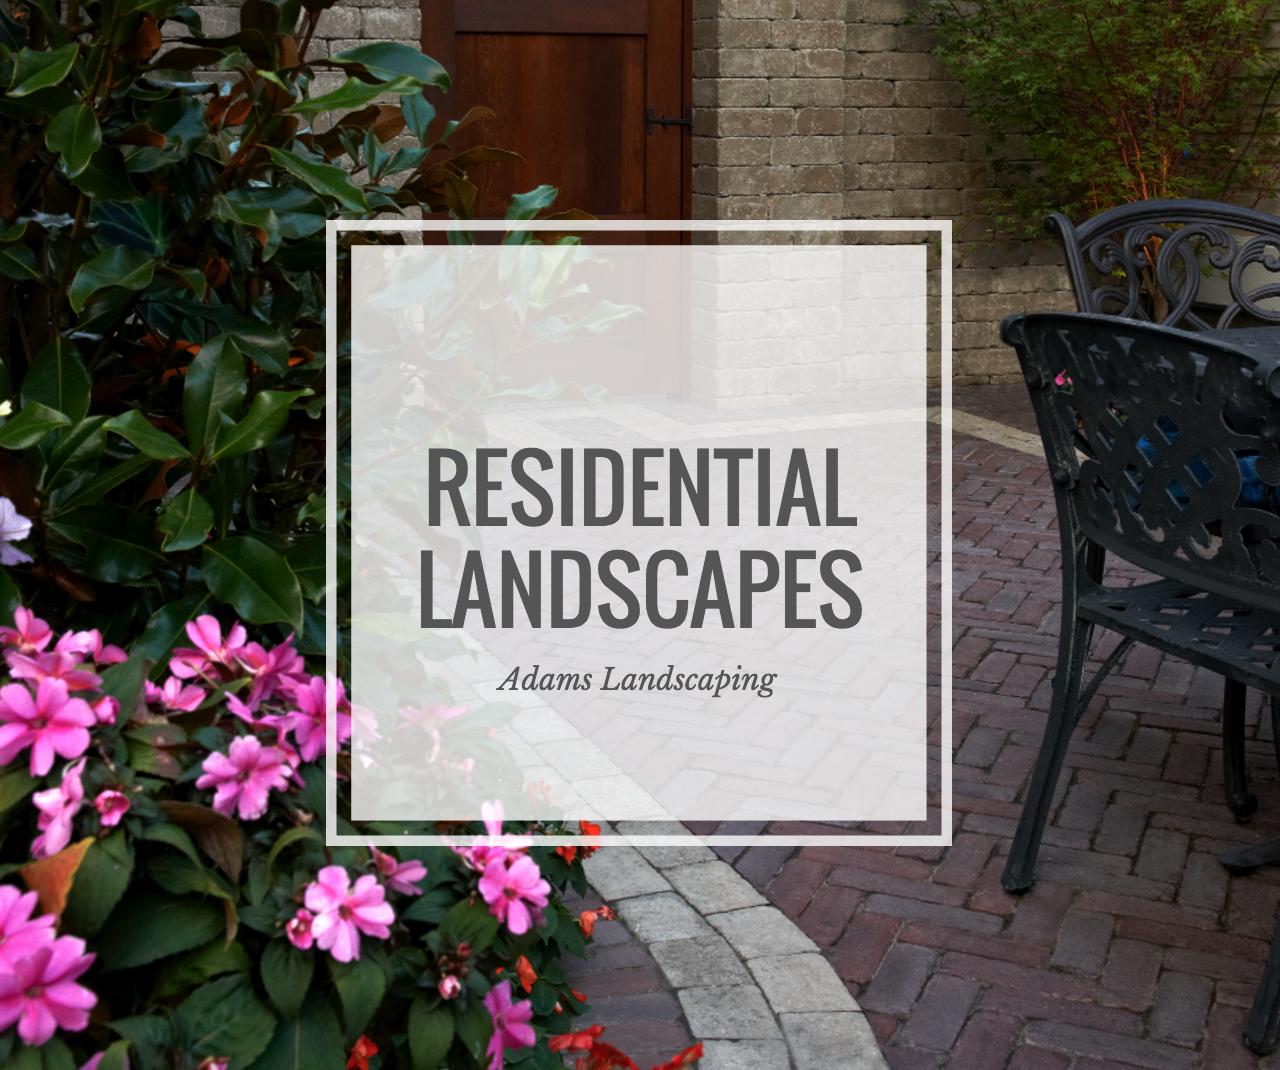 Residential Landscapes